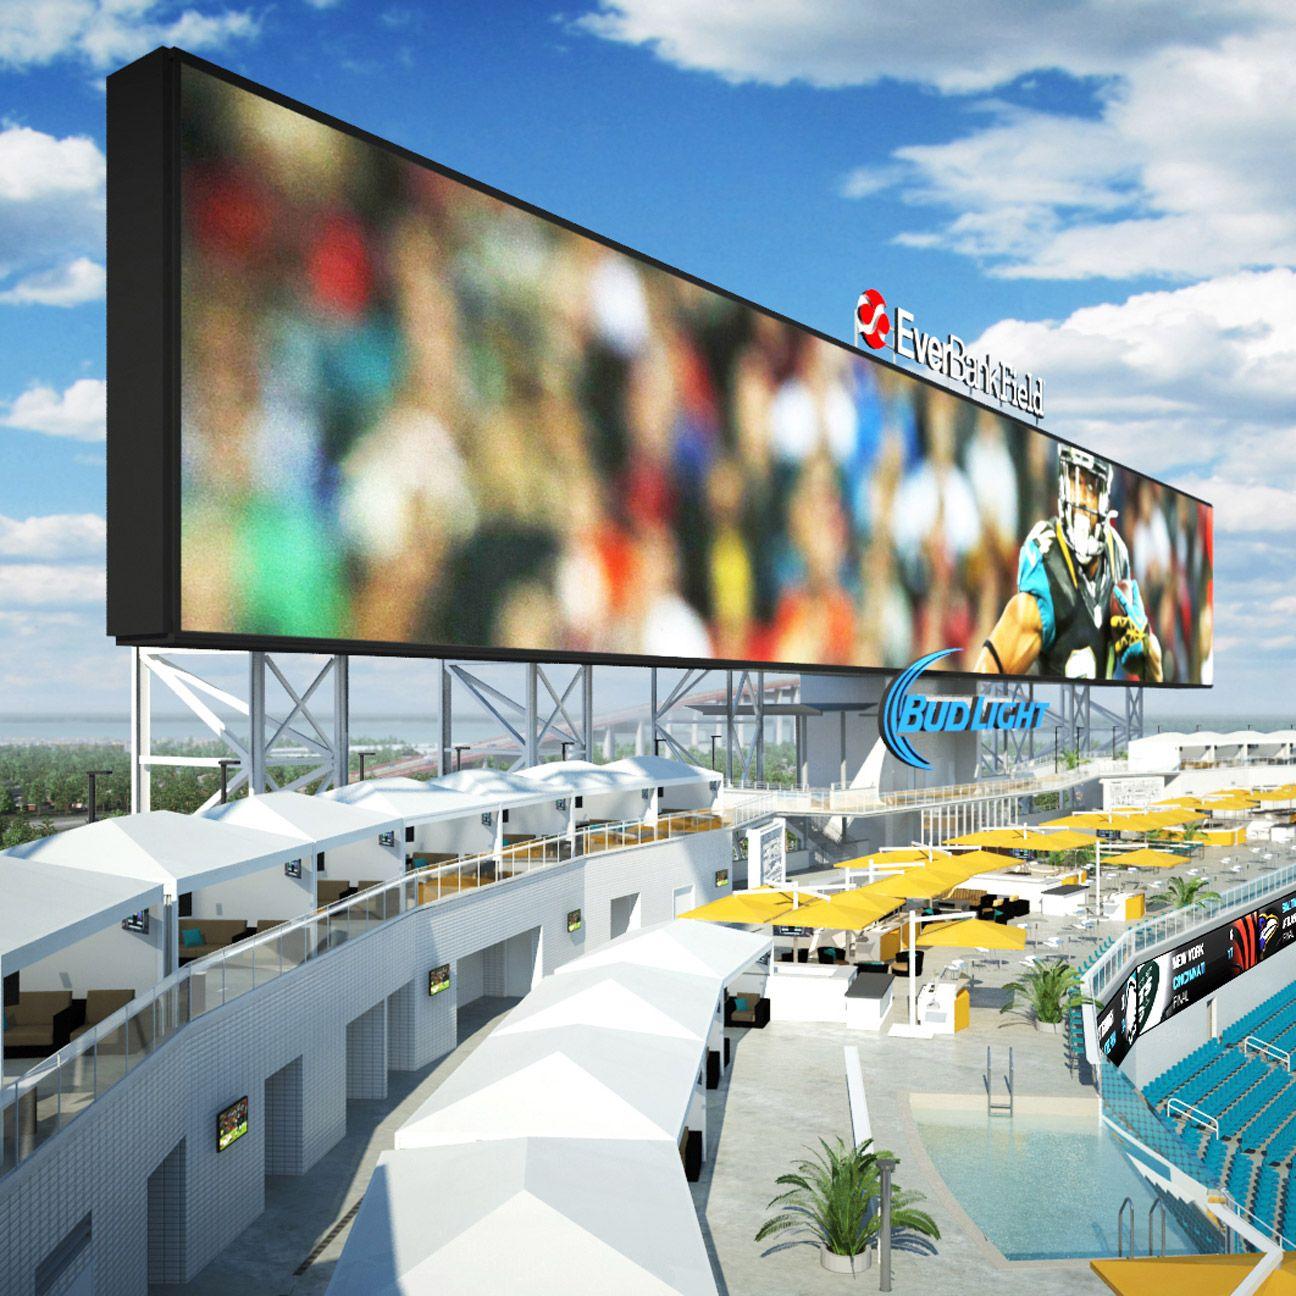 Jacksonville Jaguars To Have Poolside Cabanas In Stadium